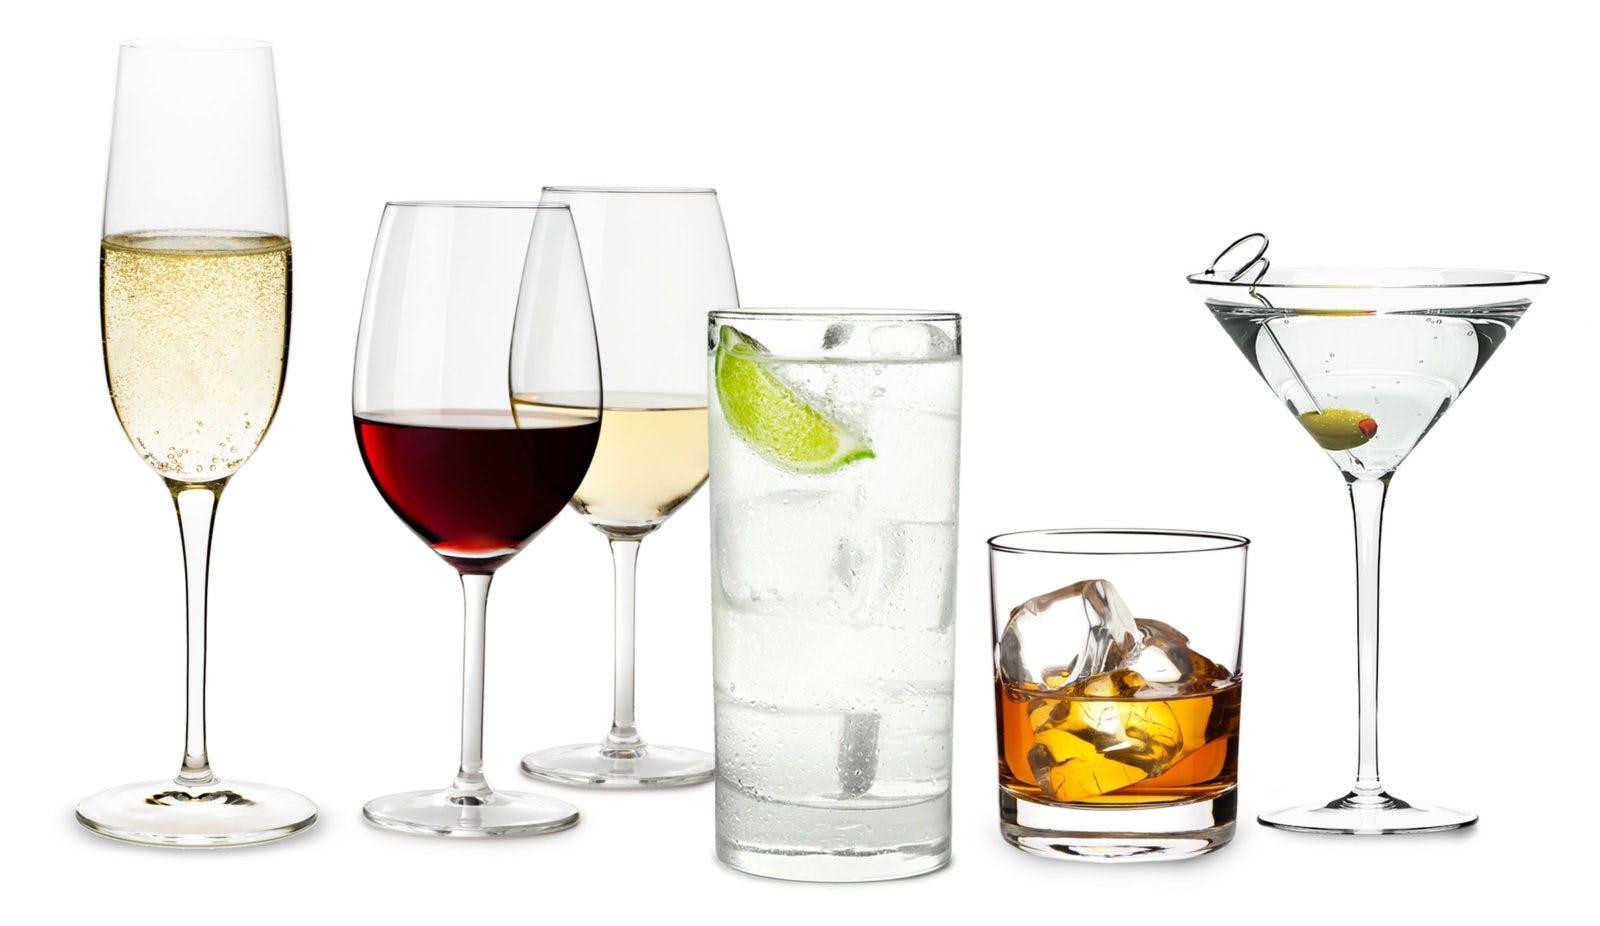 Alcohol-grams-per-drink_top5-1600x926